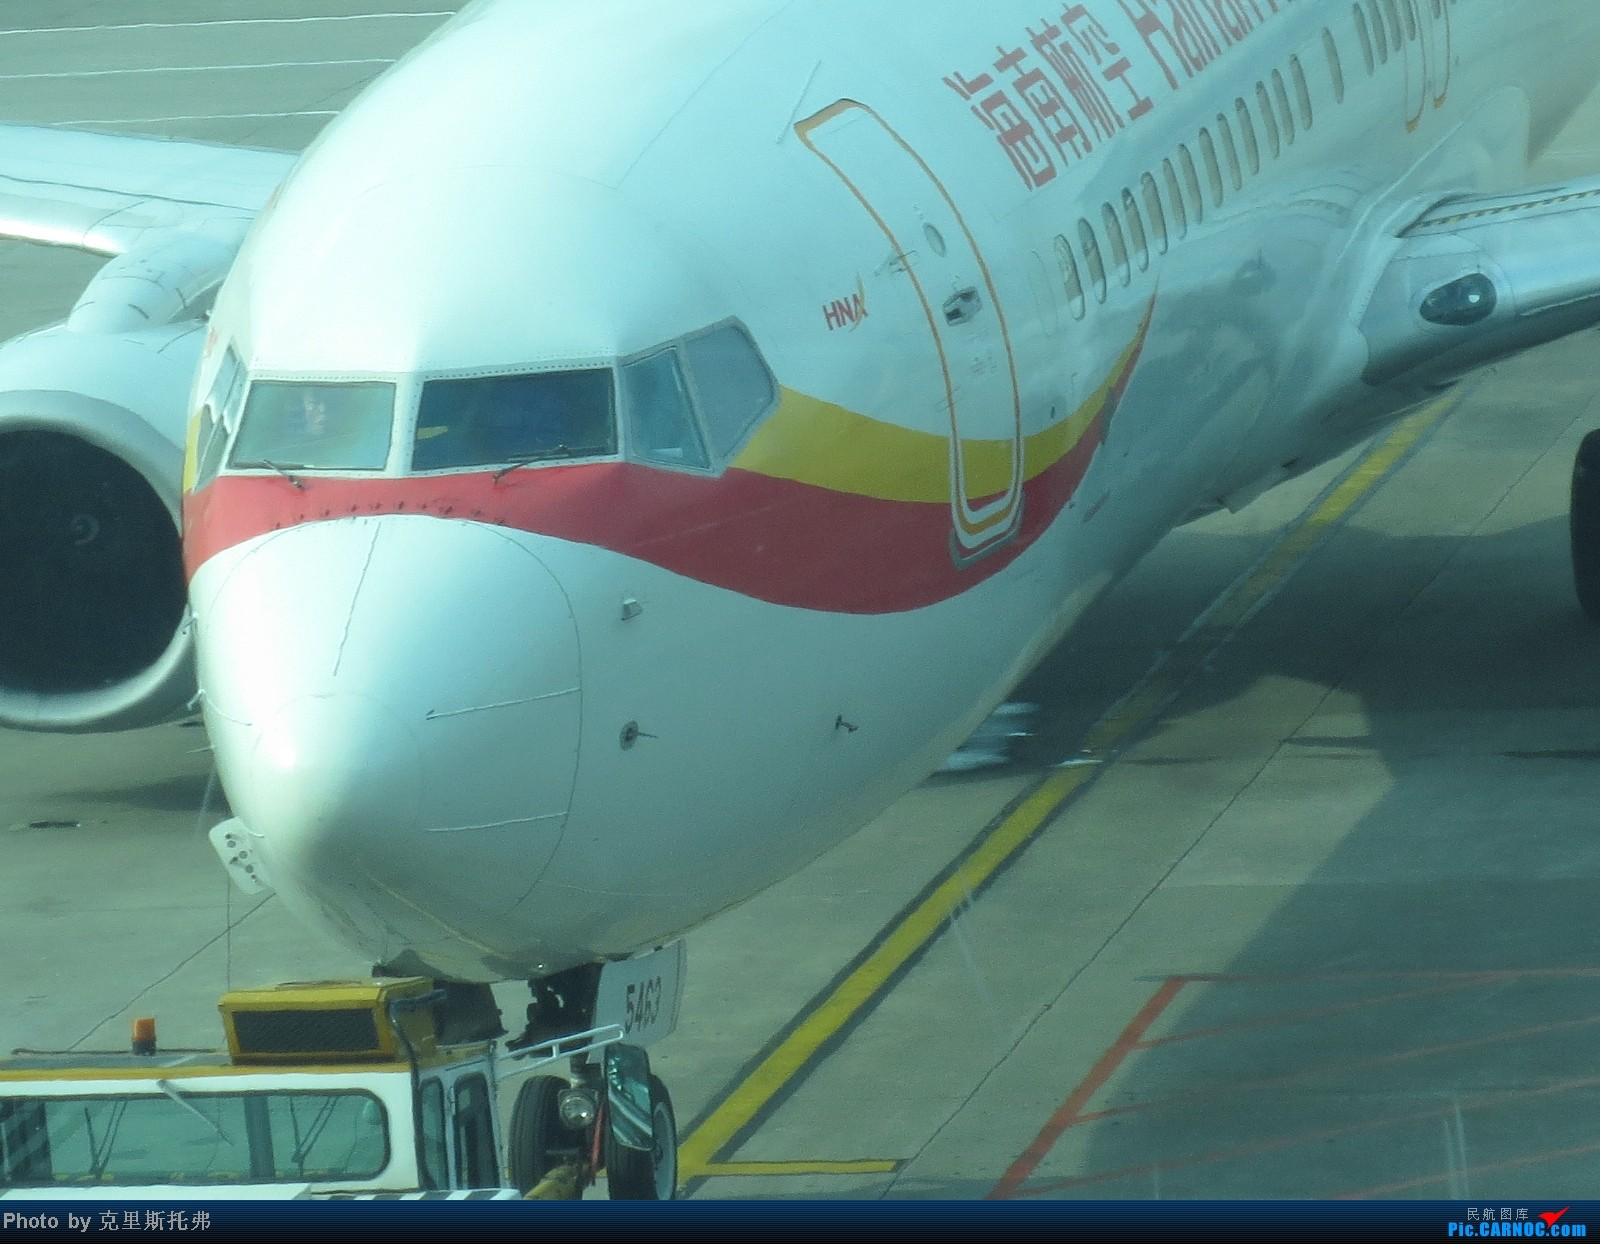 Re:[原创]【广州,你好!】八月齐鲁行 第一集 {初到齐鲁城} 不期而遇,鹏程行万里 相伴相惜,享飞行至美 BOEING 737-700 B-5062